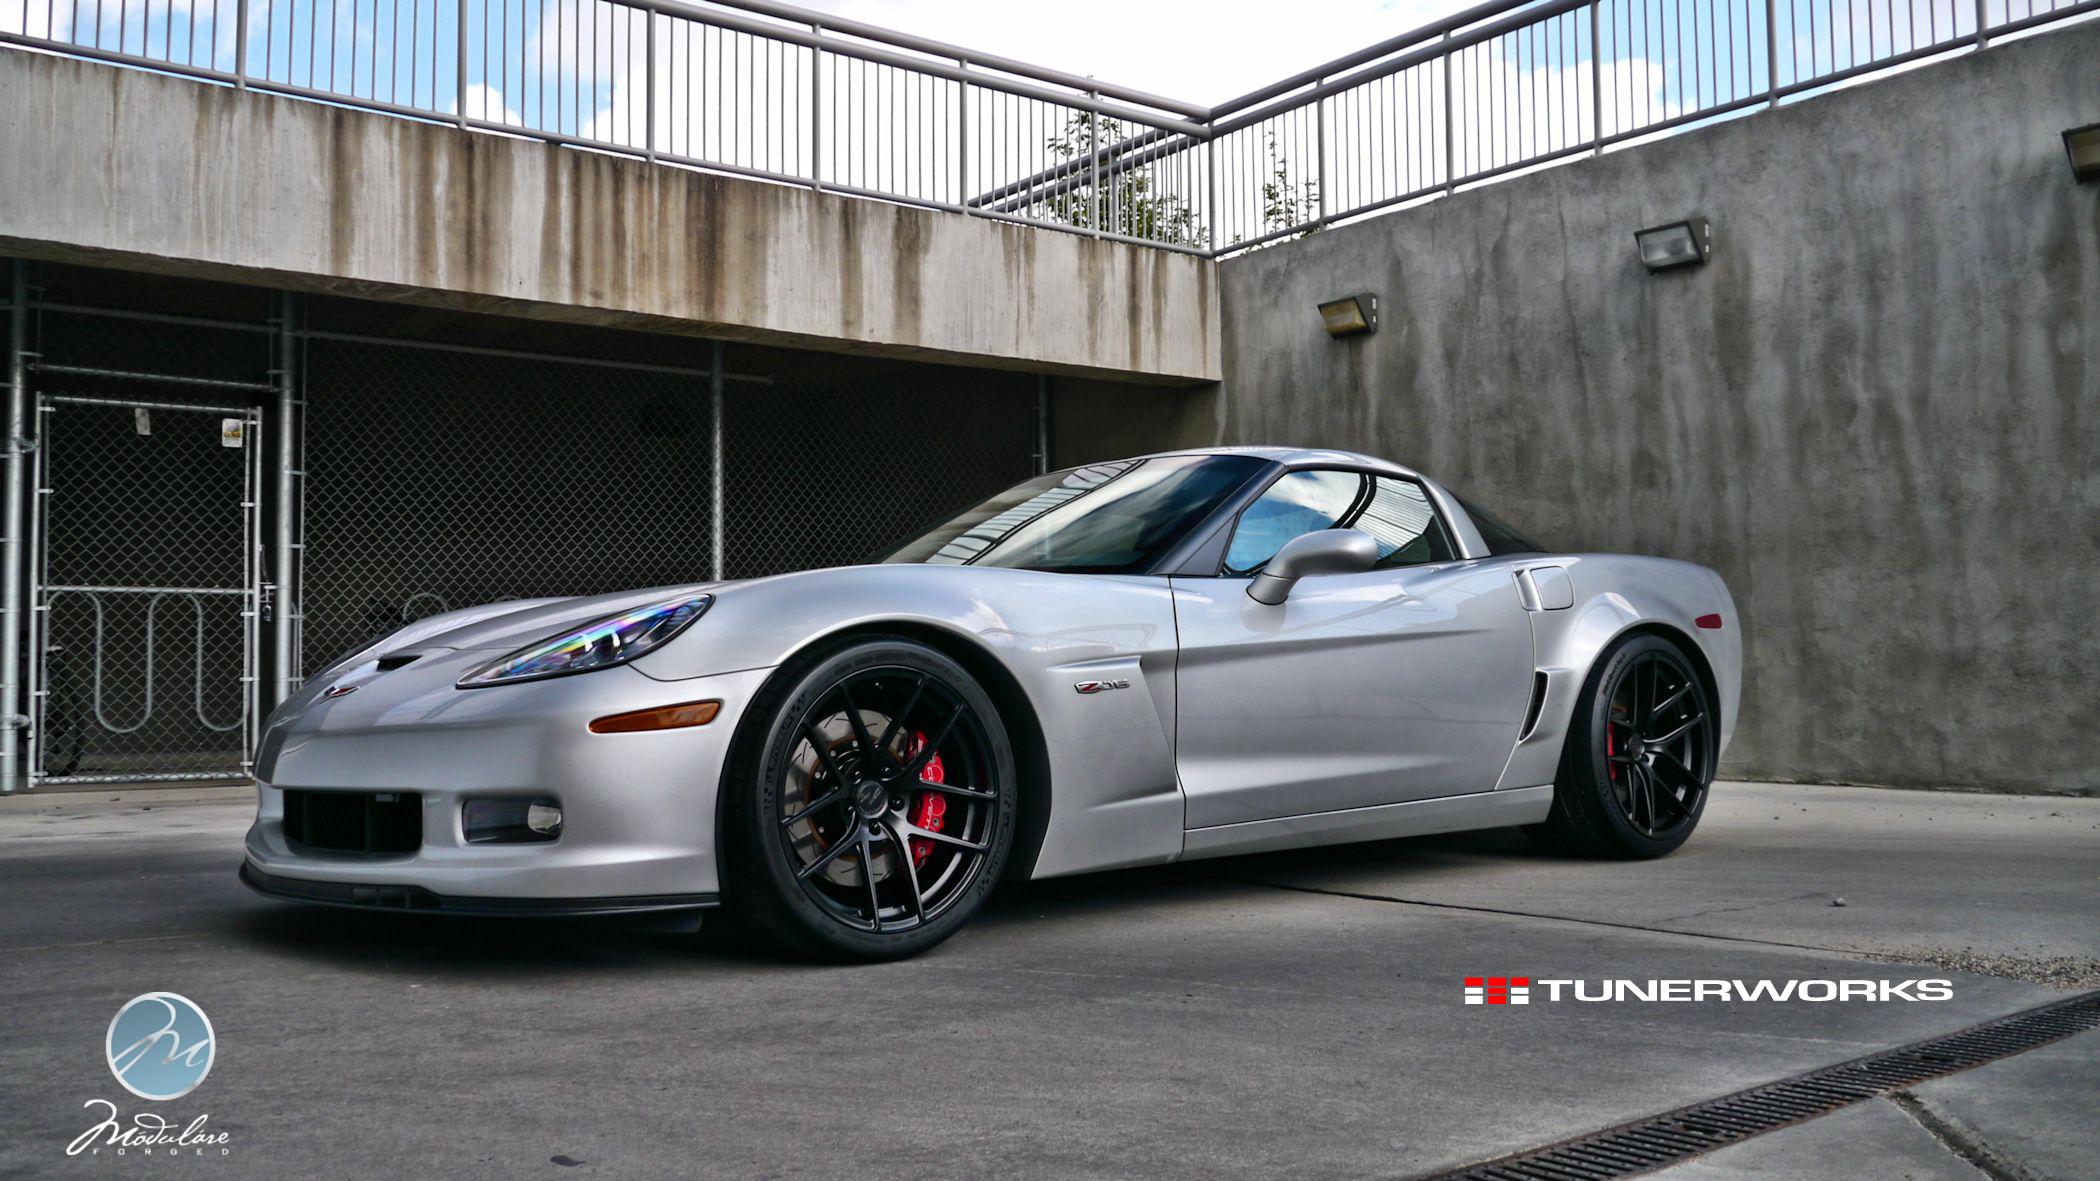 Modulare Wheels Tunerworks Performance Corvette C6 Z06